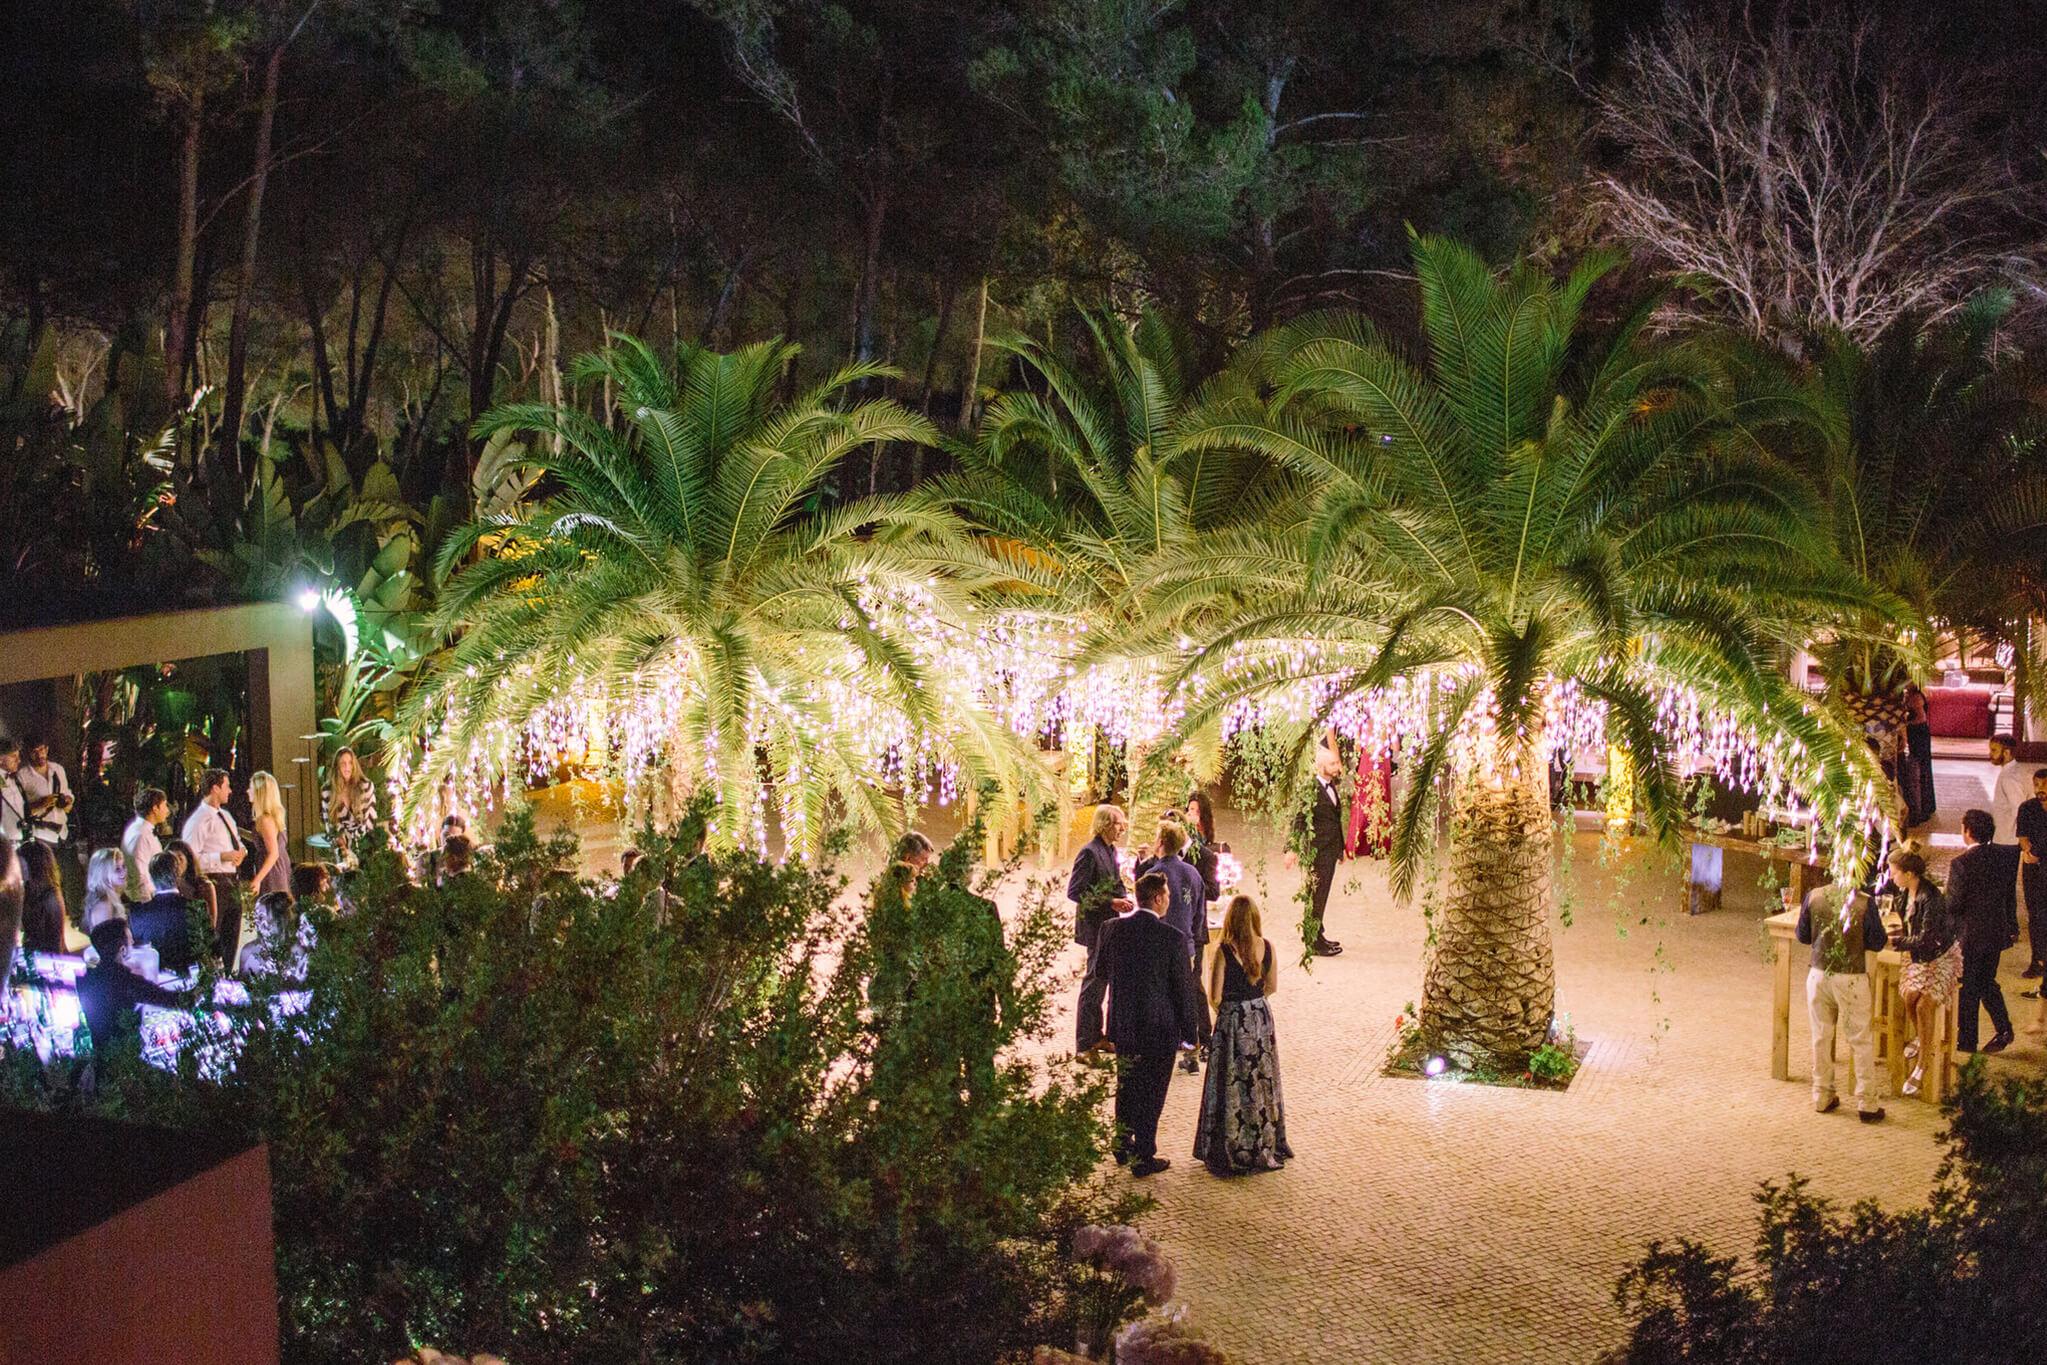 https://www.white-ibiza.com/wp-content/uploads/2020/03/white-ibiza-weddings-velvet-circus-ibiza-2020-09.jpg